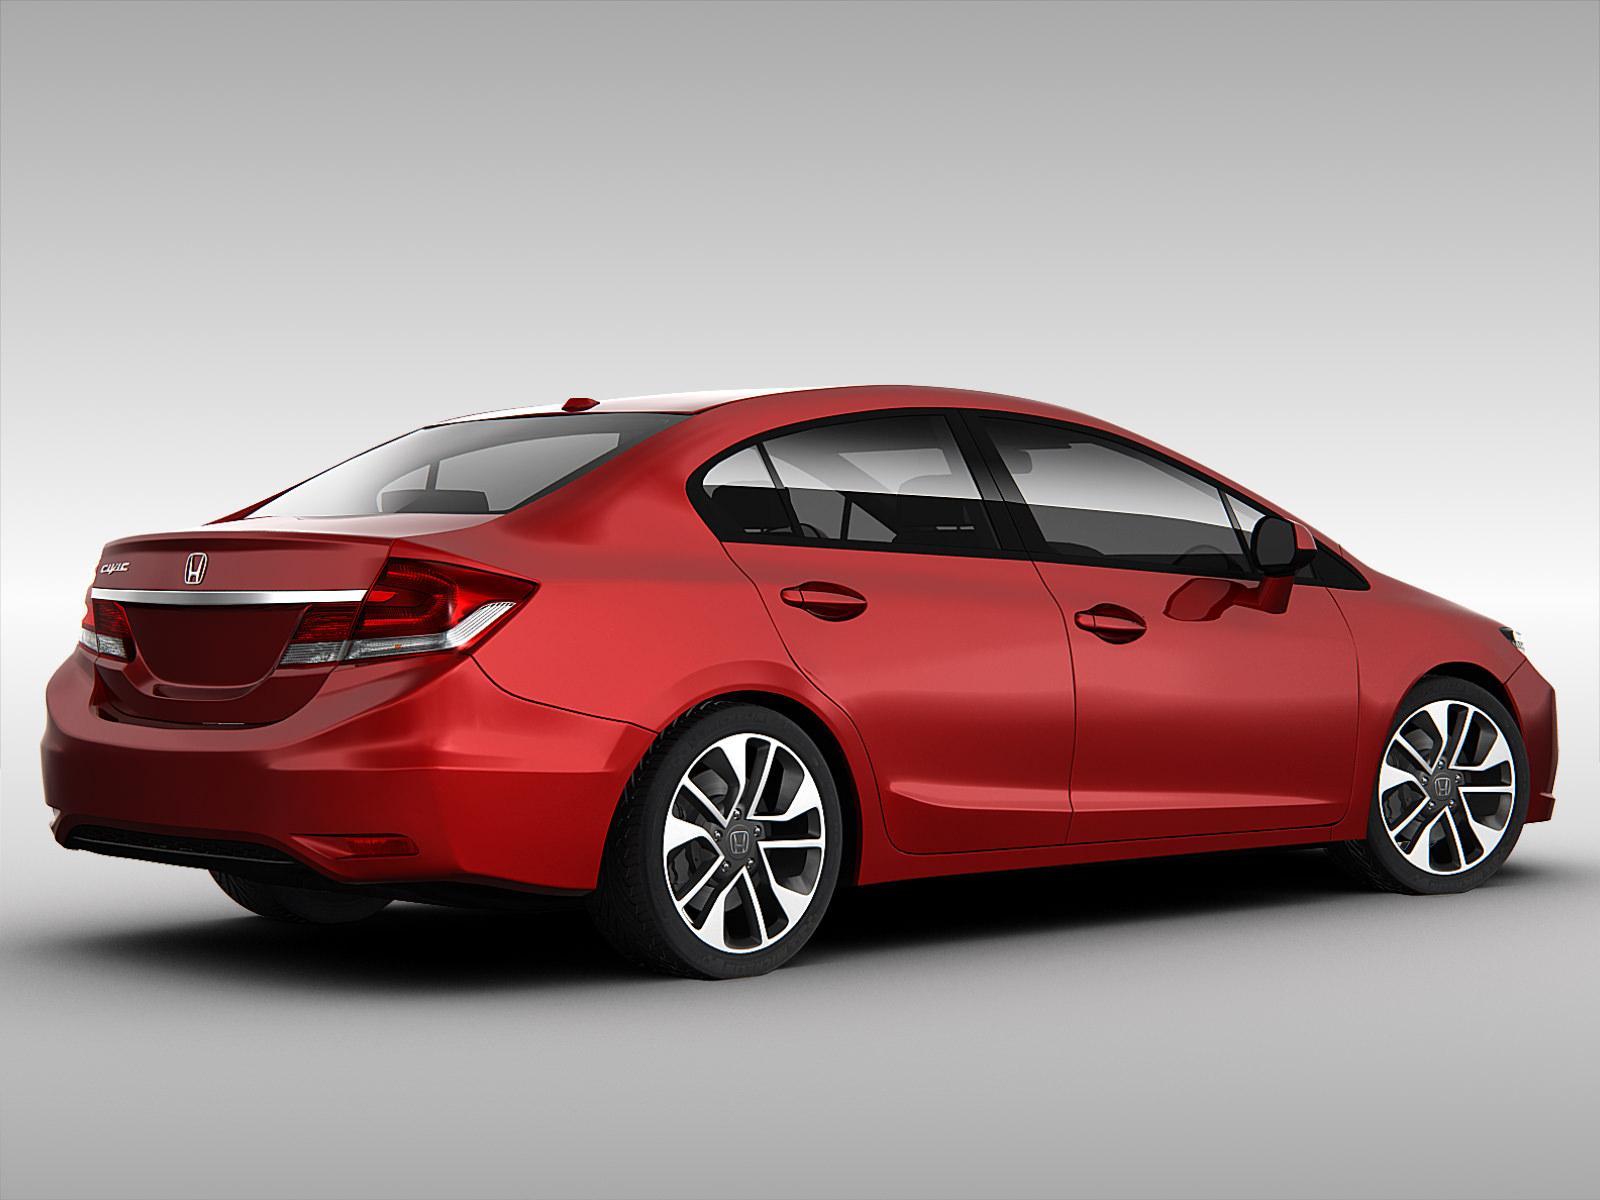 Honda civic 2013 3d model max obj 3ds fbx for Different honda civic models